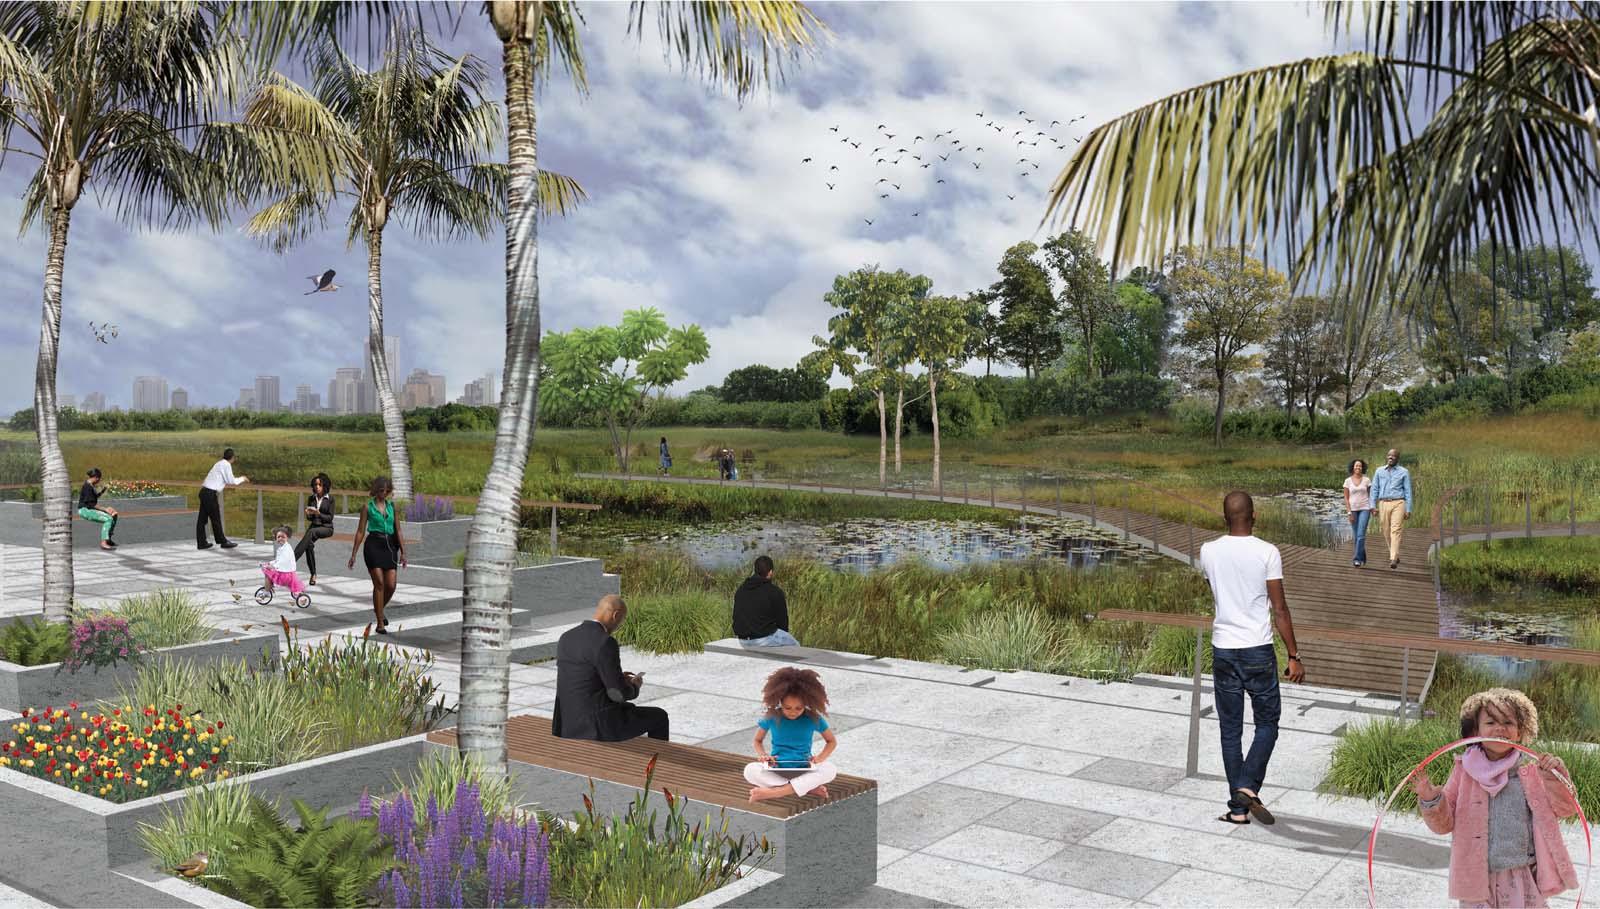 Impression Ilubirin wetland park